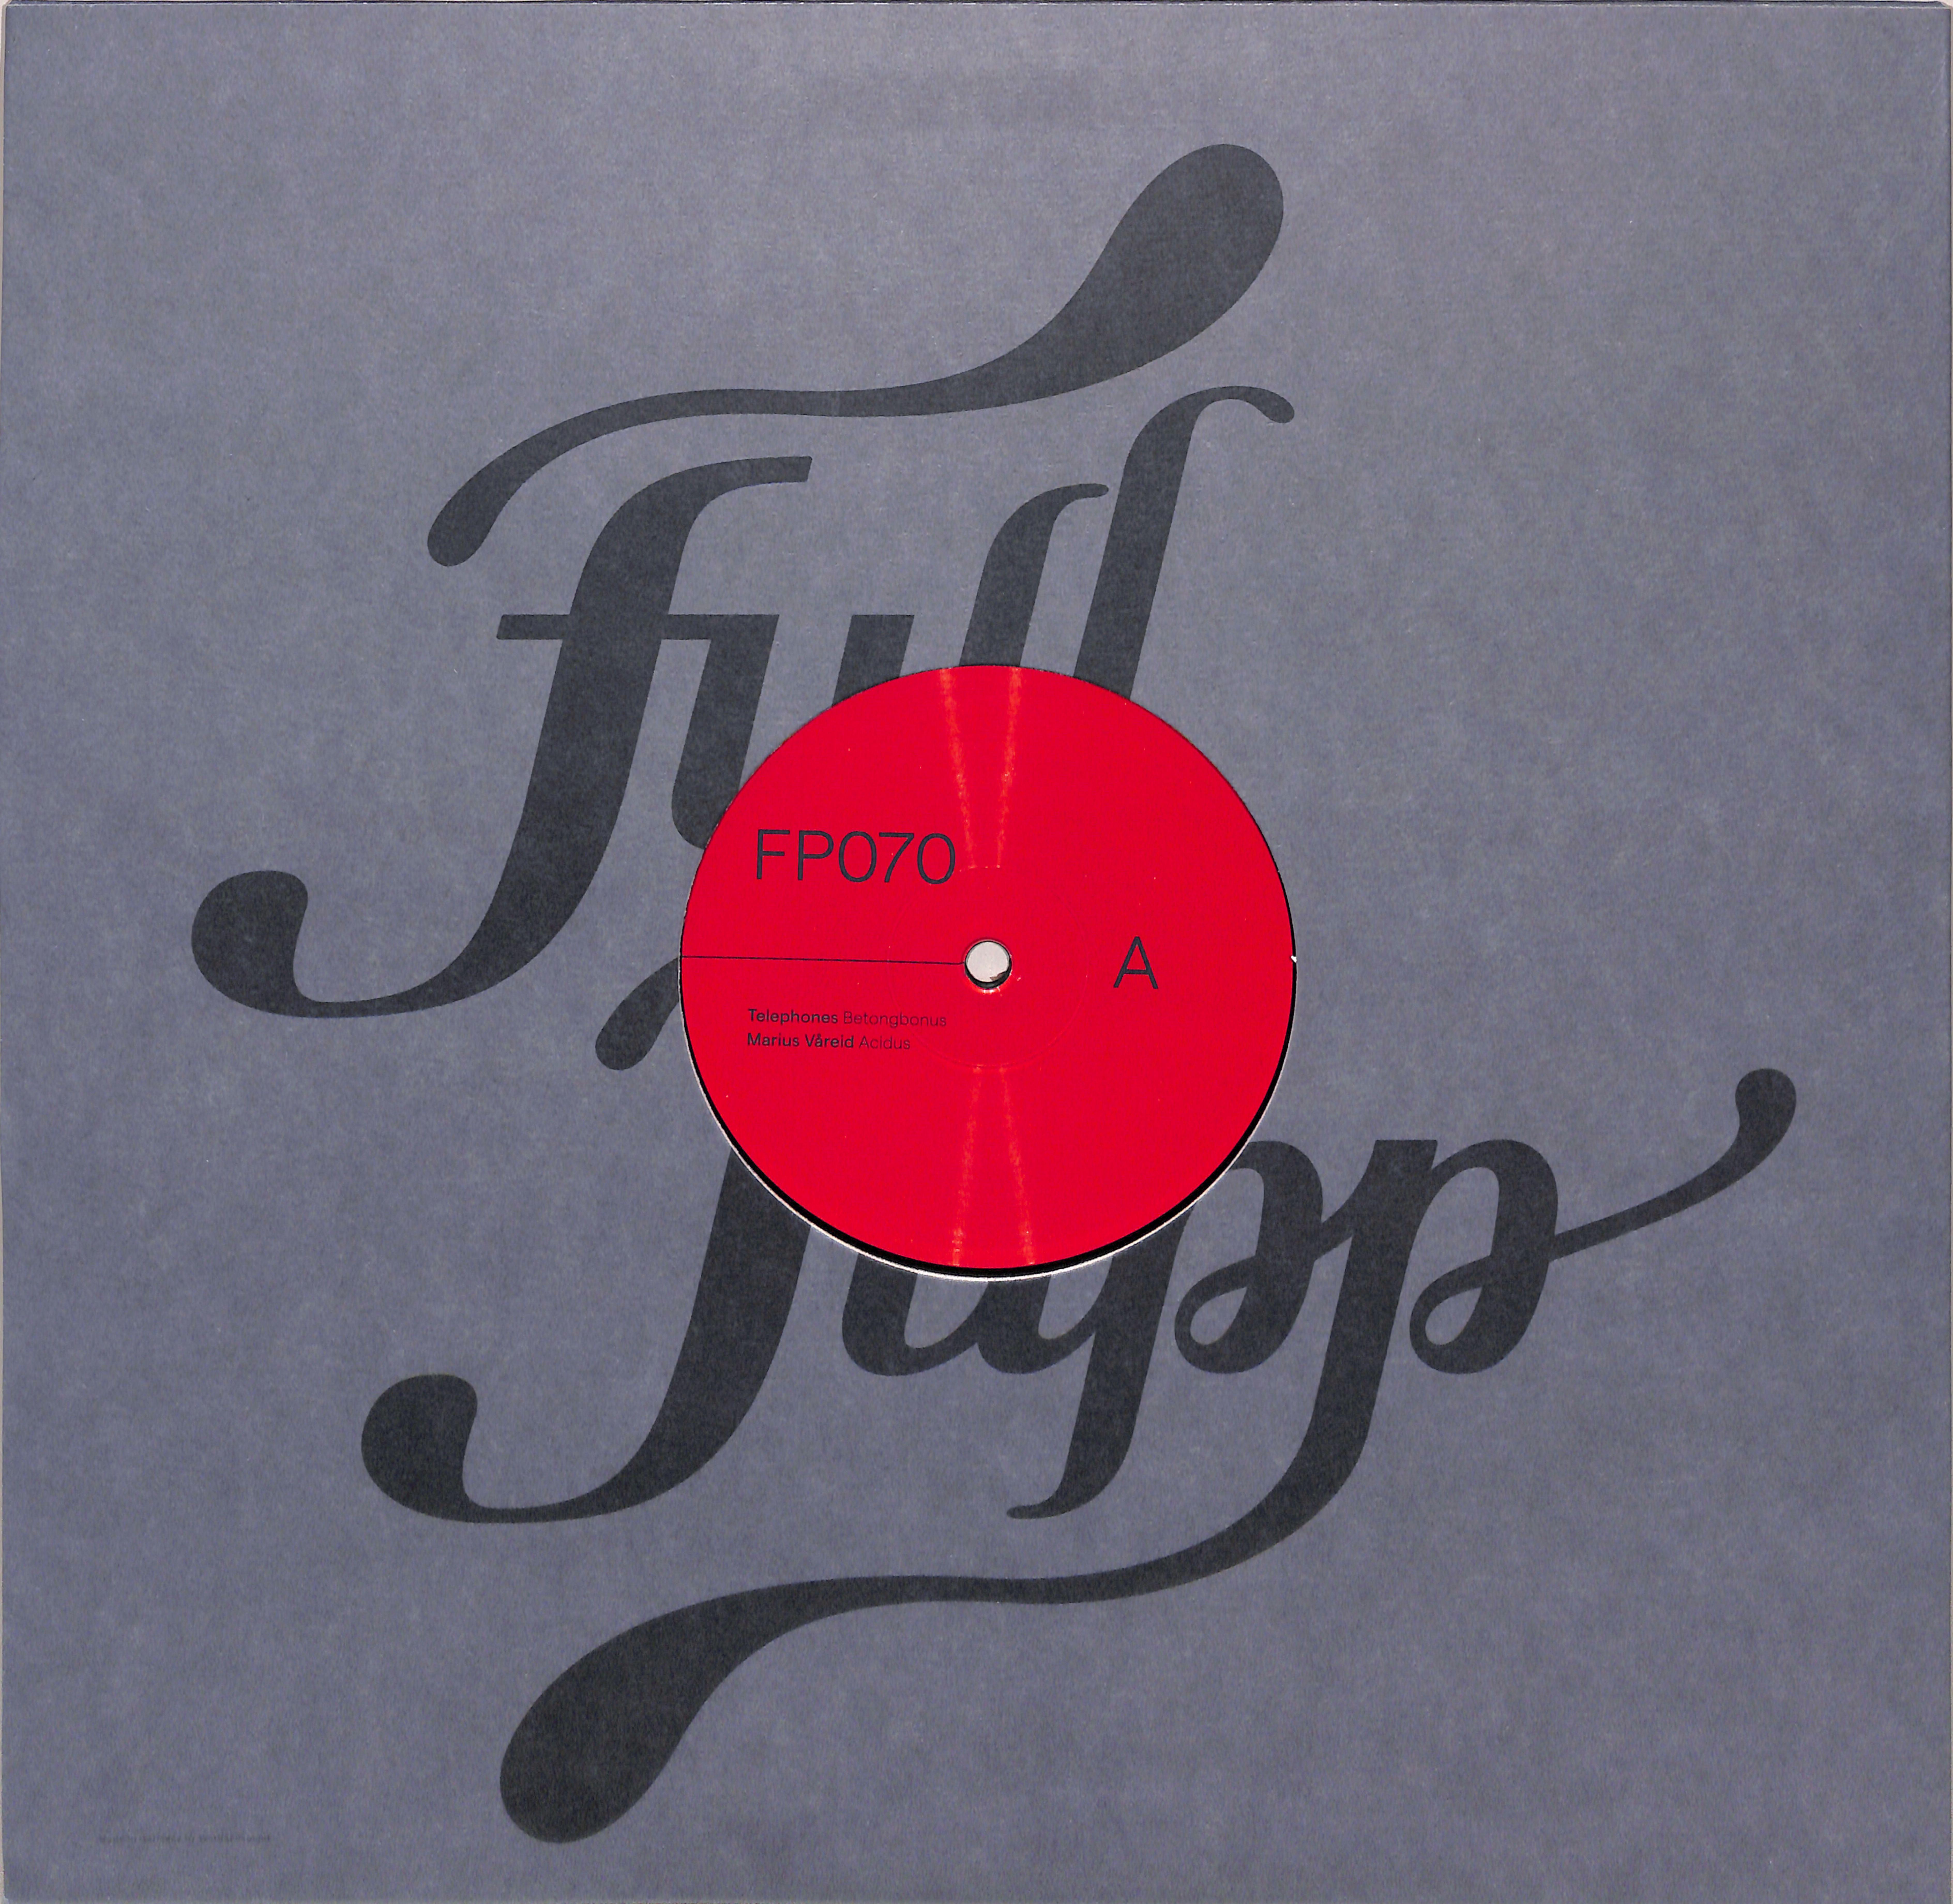 Telephones, Marius Vareid, Christian Engh - FULL PUPP 15 YEARS PART 2 - EP